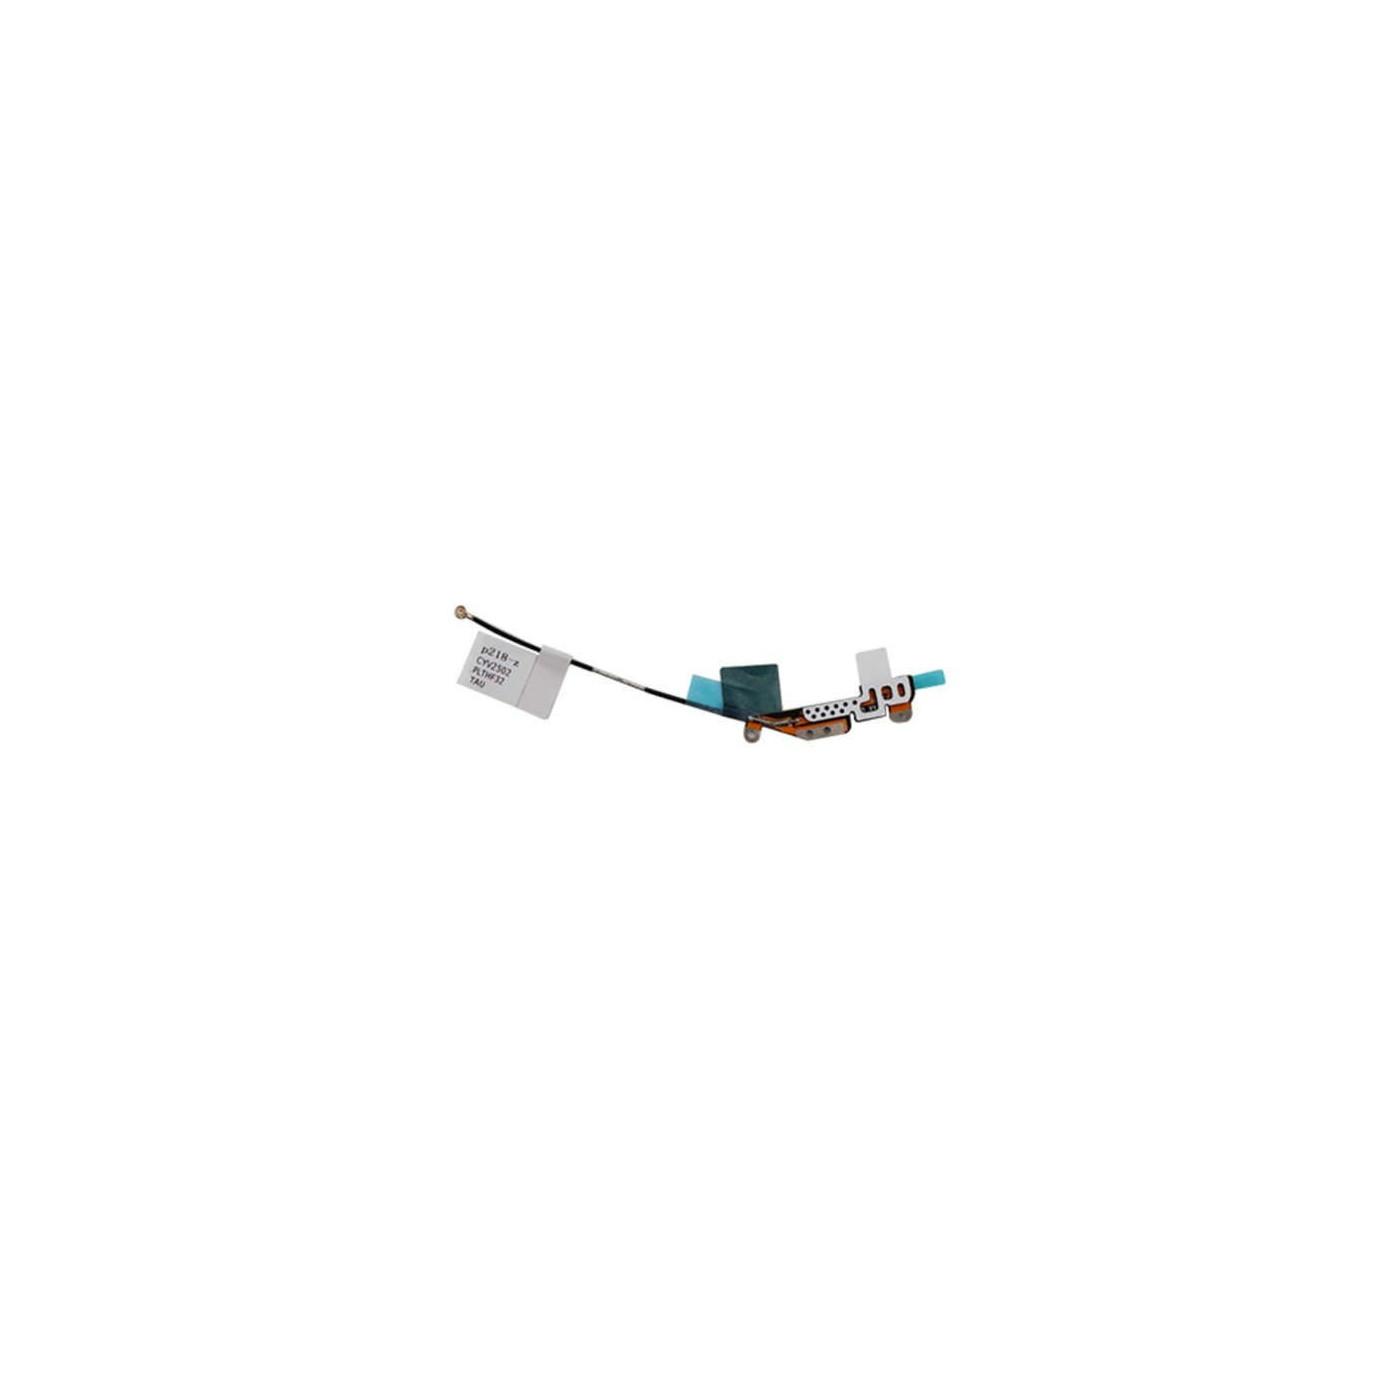 Antena de GPS para apple ipad mini reemplazo plano flexible